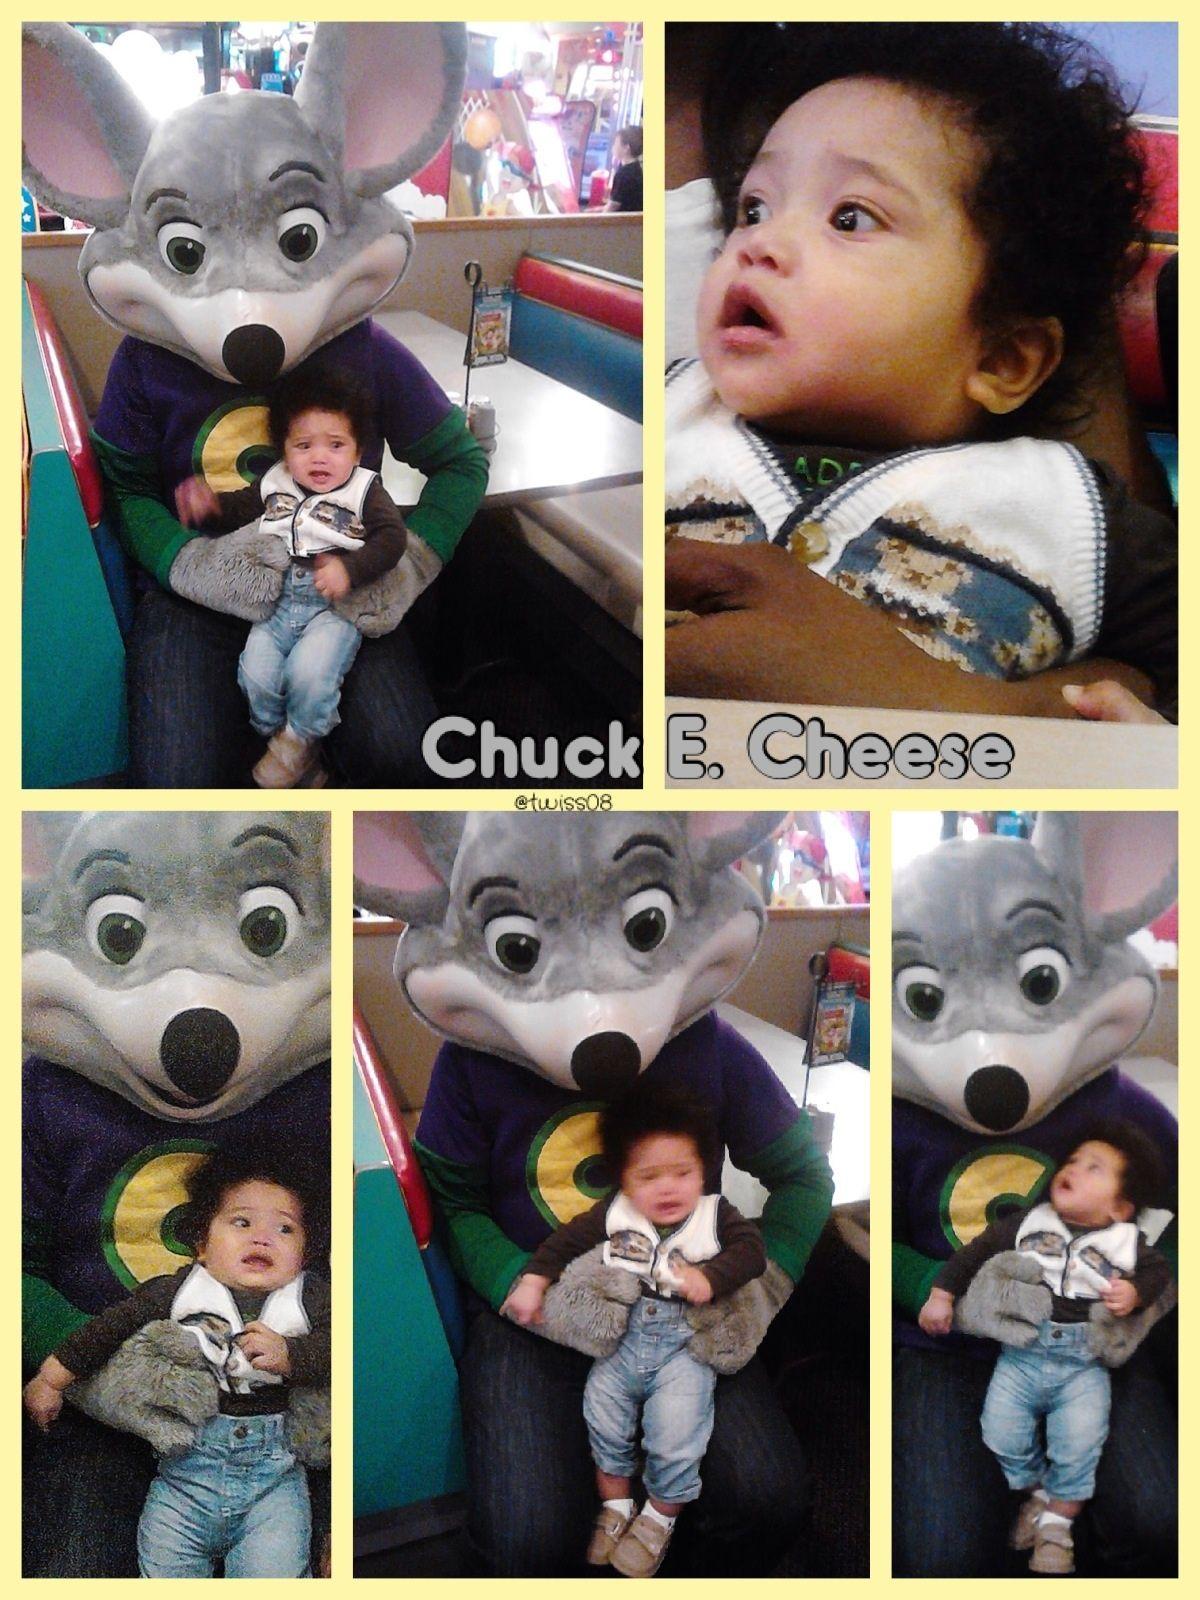 Blasian baby at Chuck E Cheese. Scared :(  BlasianBabies.com